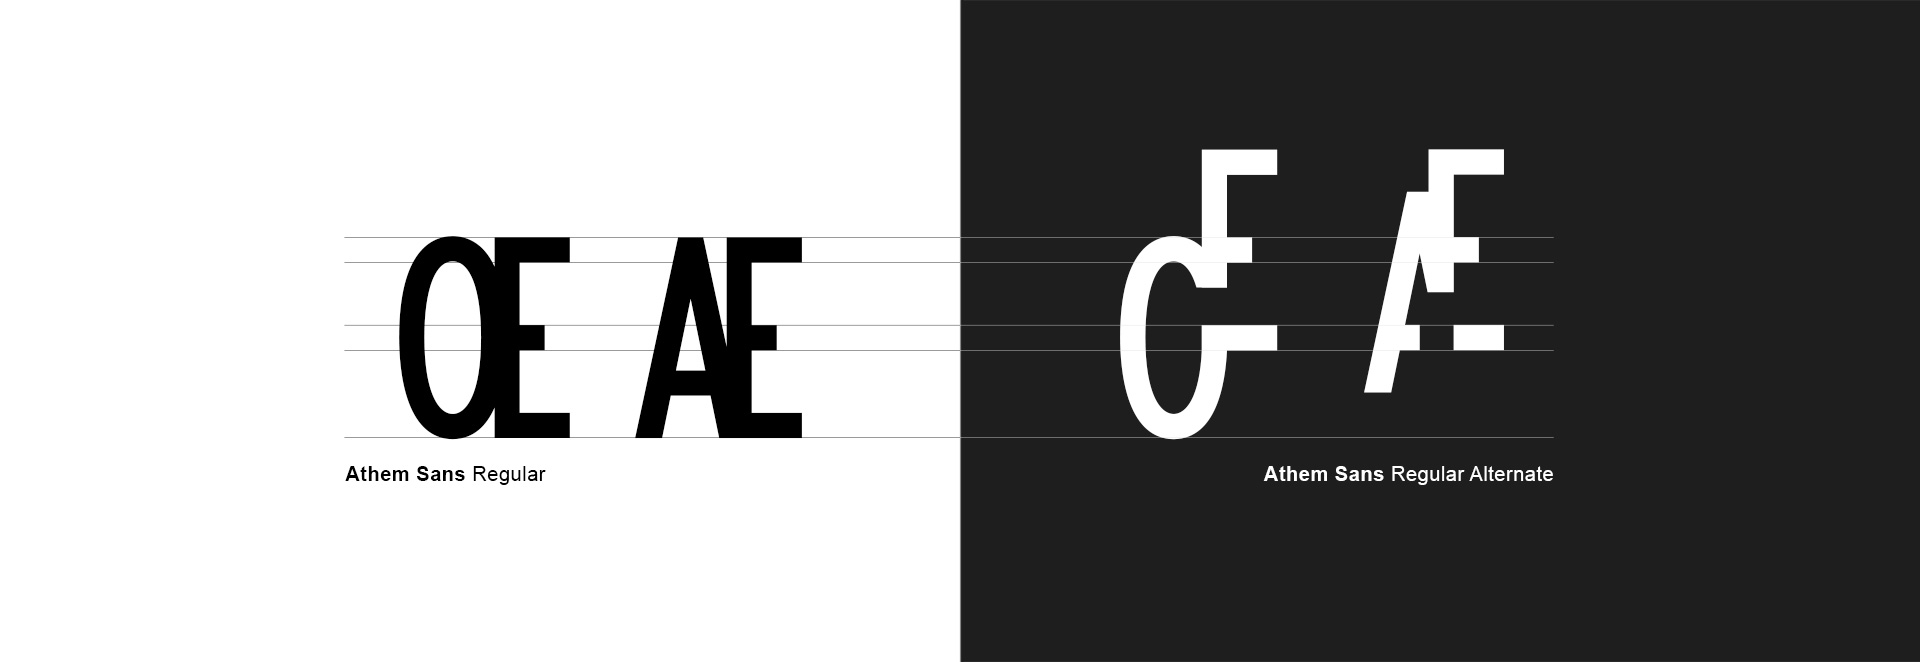 alphabet athem sans typographie